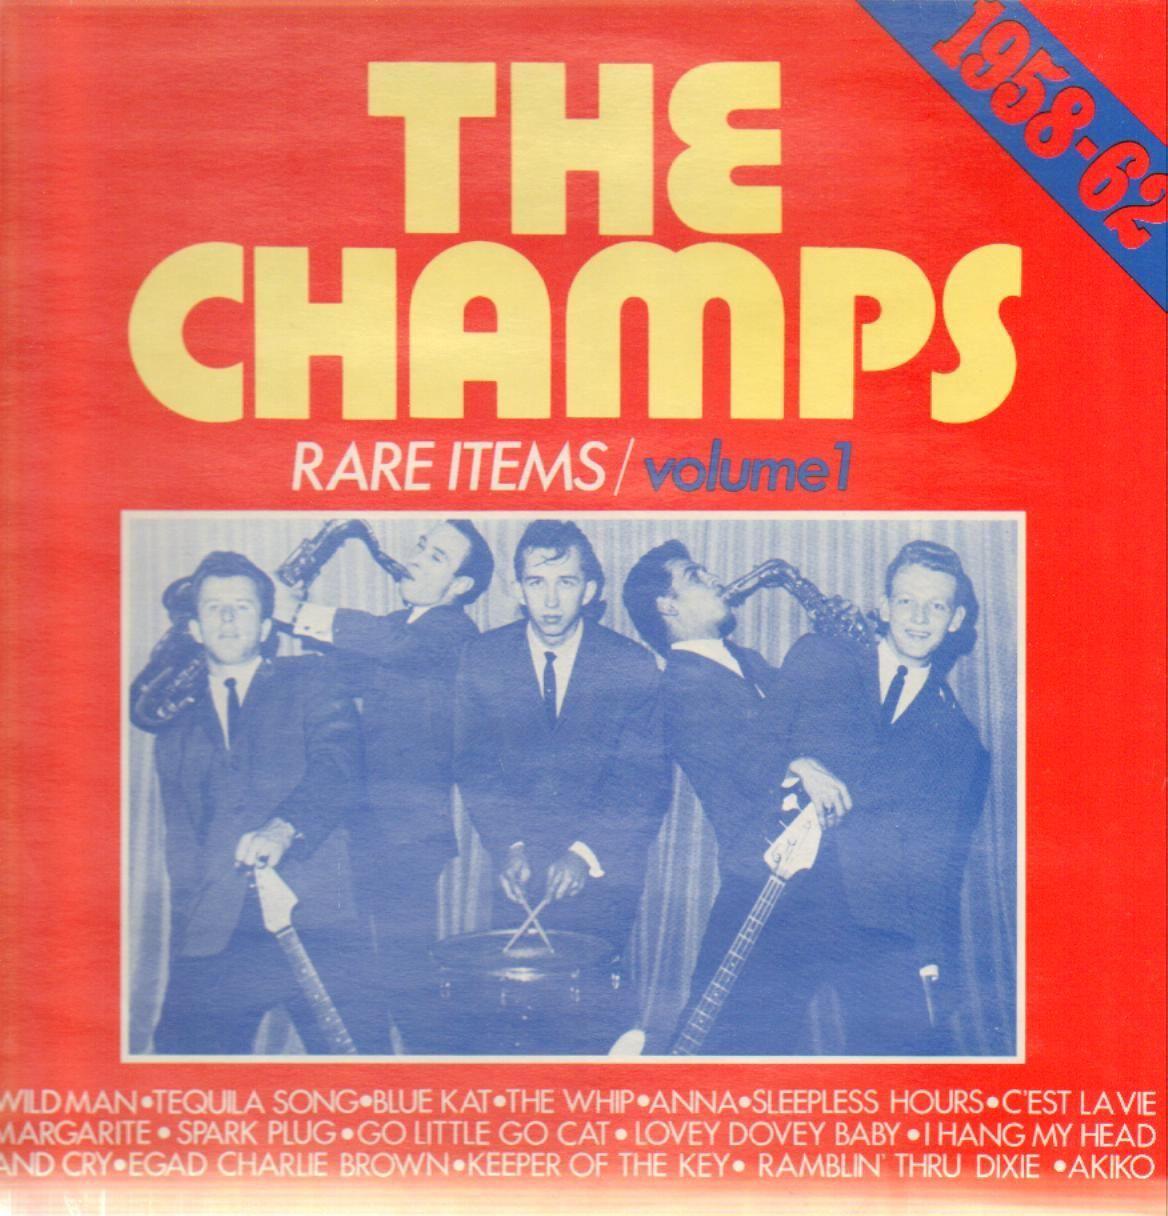 Rare Items Volume 1 - The Champs - LP (London)